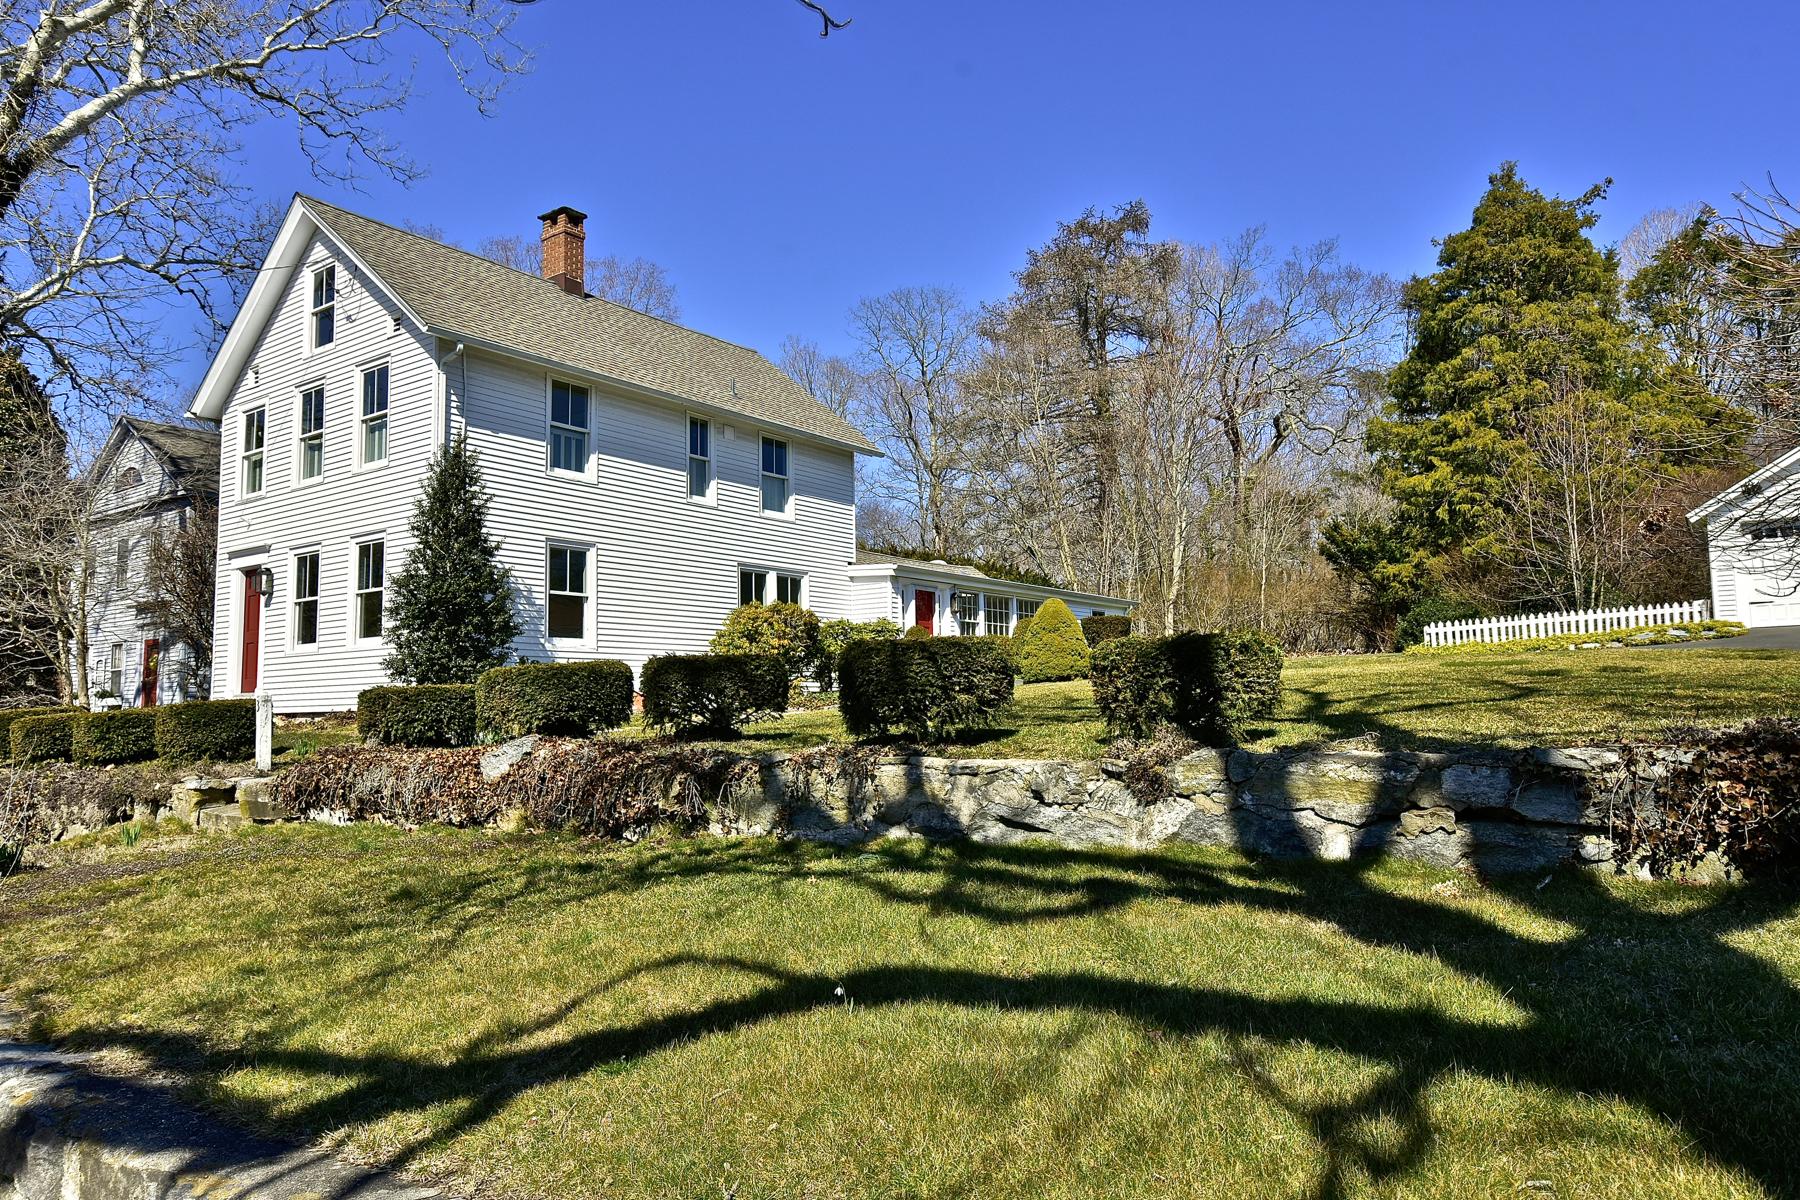 Moradia para Venda às Gracious Essex Village Colonial 38 Prospect St Essex, Connecticut, 06426 Estados Unidos